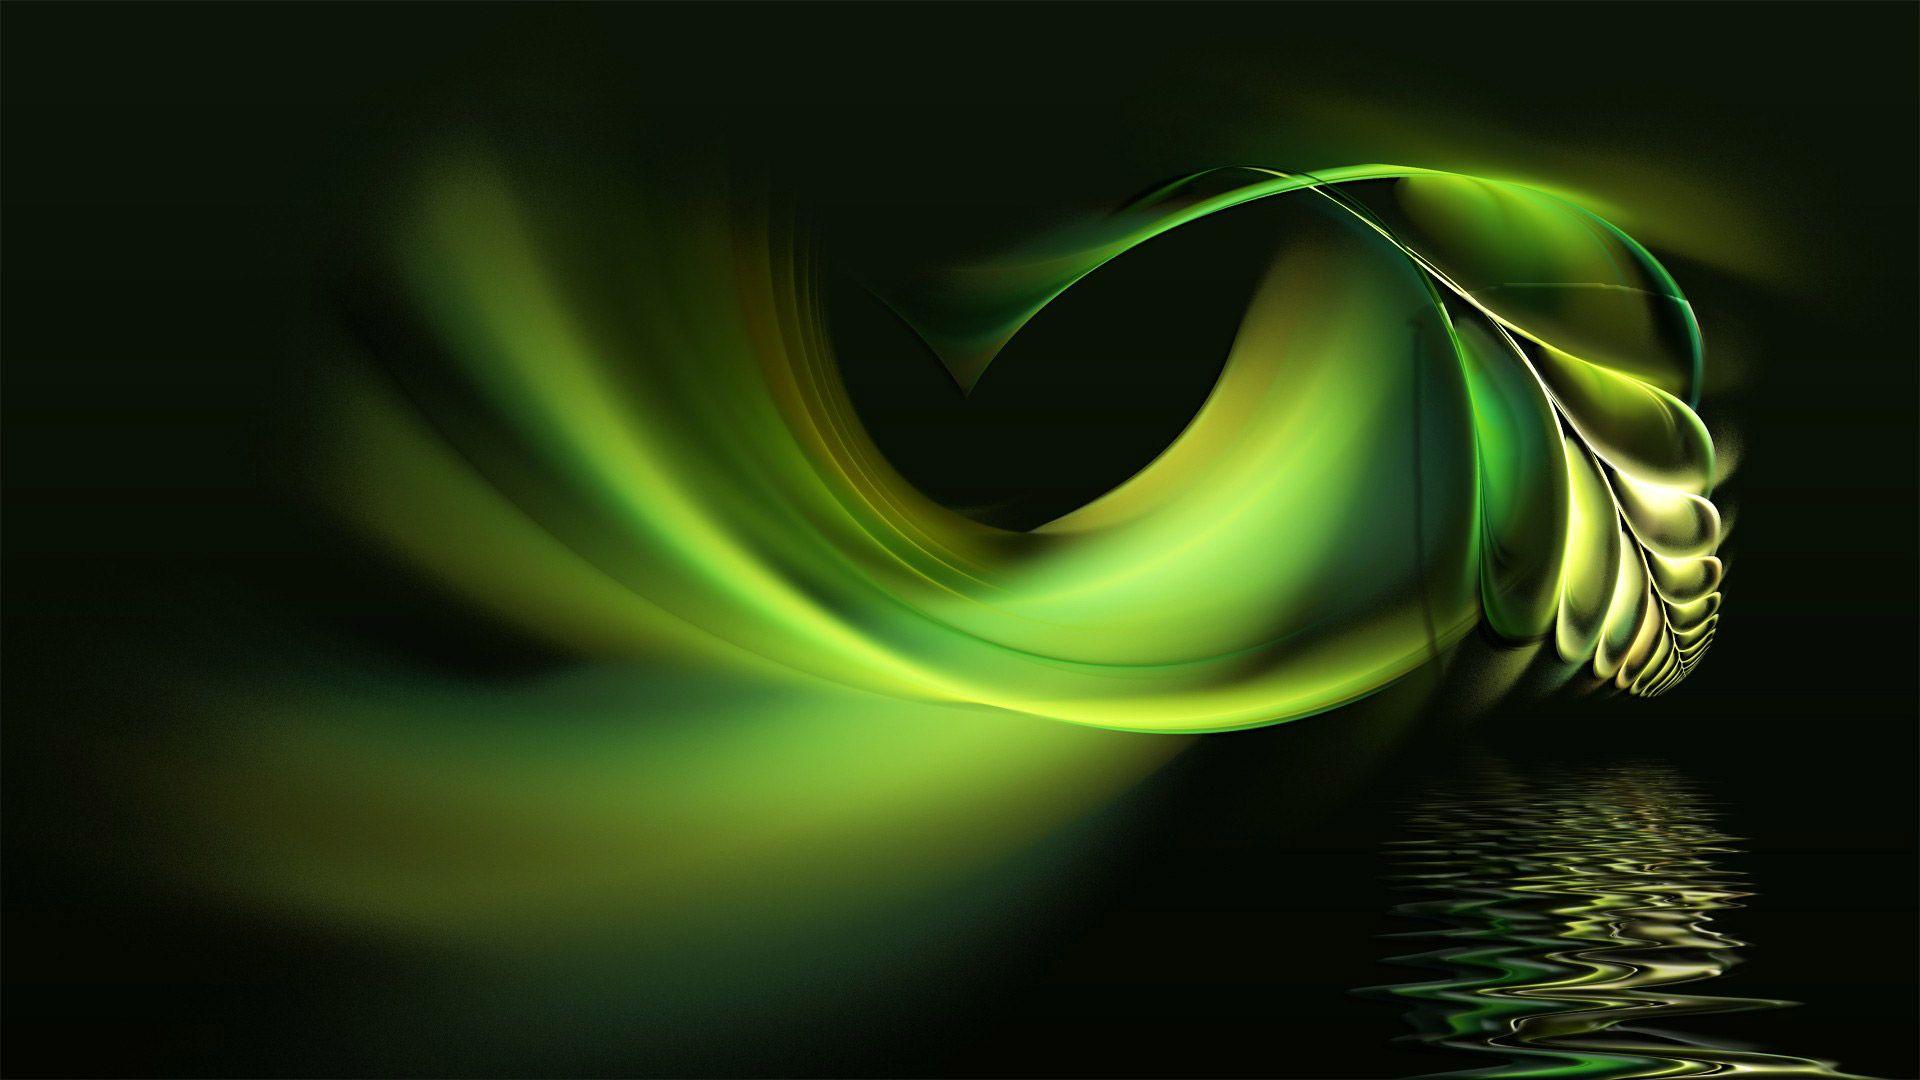 Unduh 800+ Wallpaper Abstrak Hd Green  Paling Baru